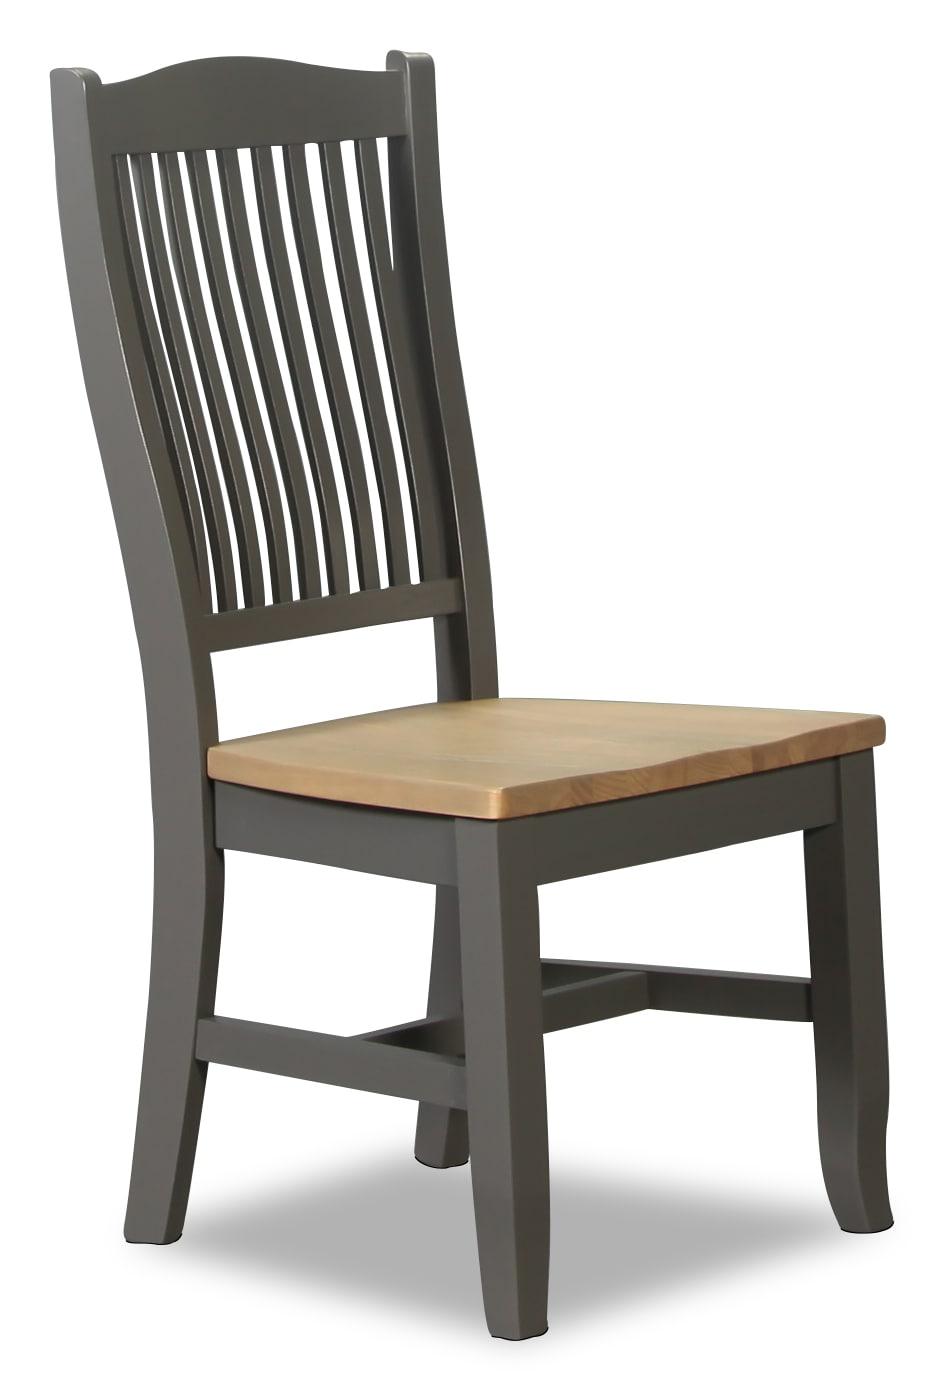 Marietta Furniture Outlet )( Home Furnitures Dreams